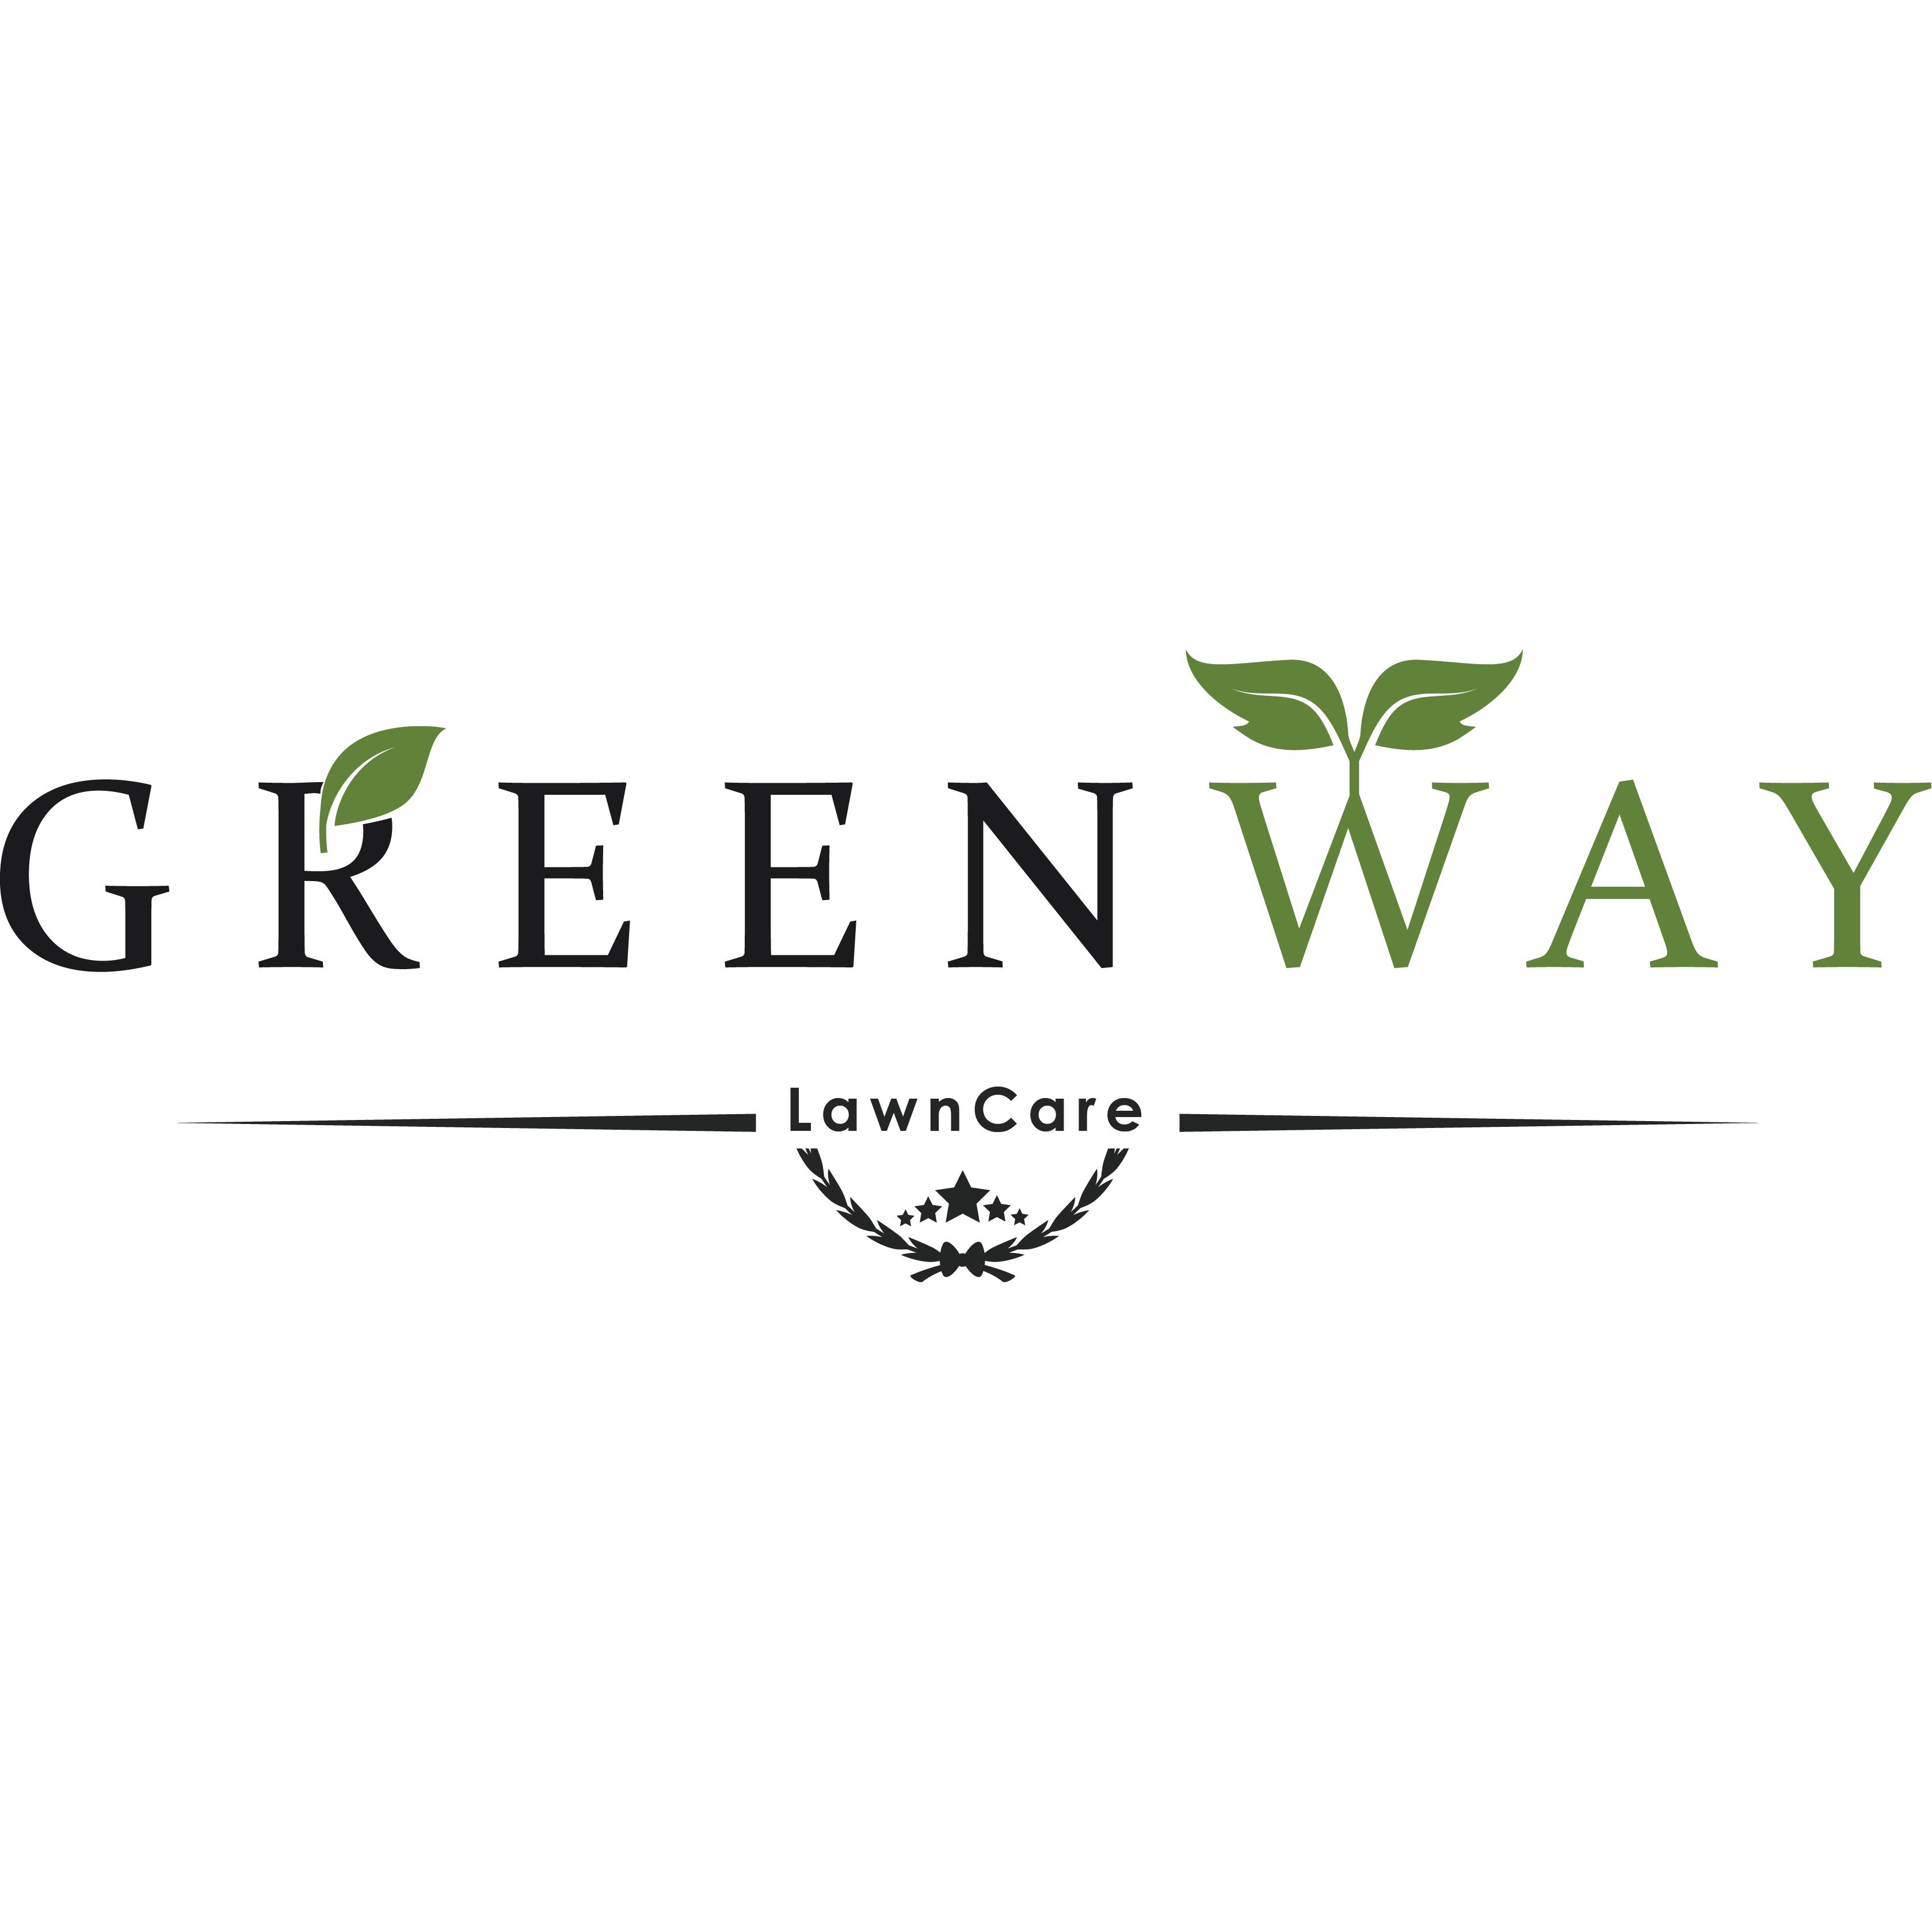 Greenway Lawncare